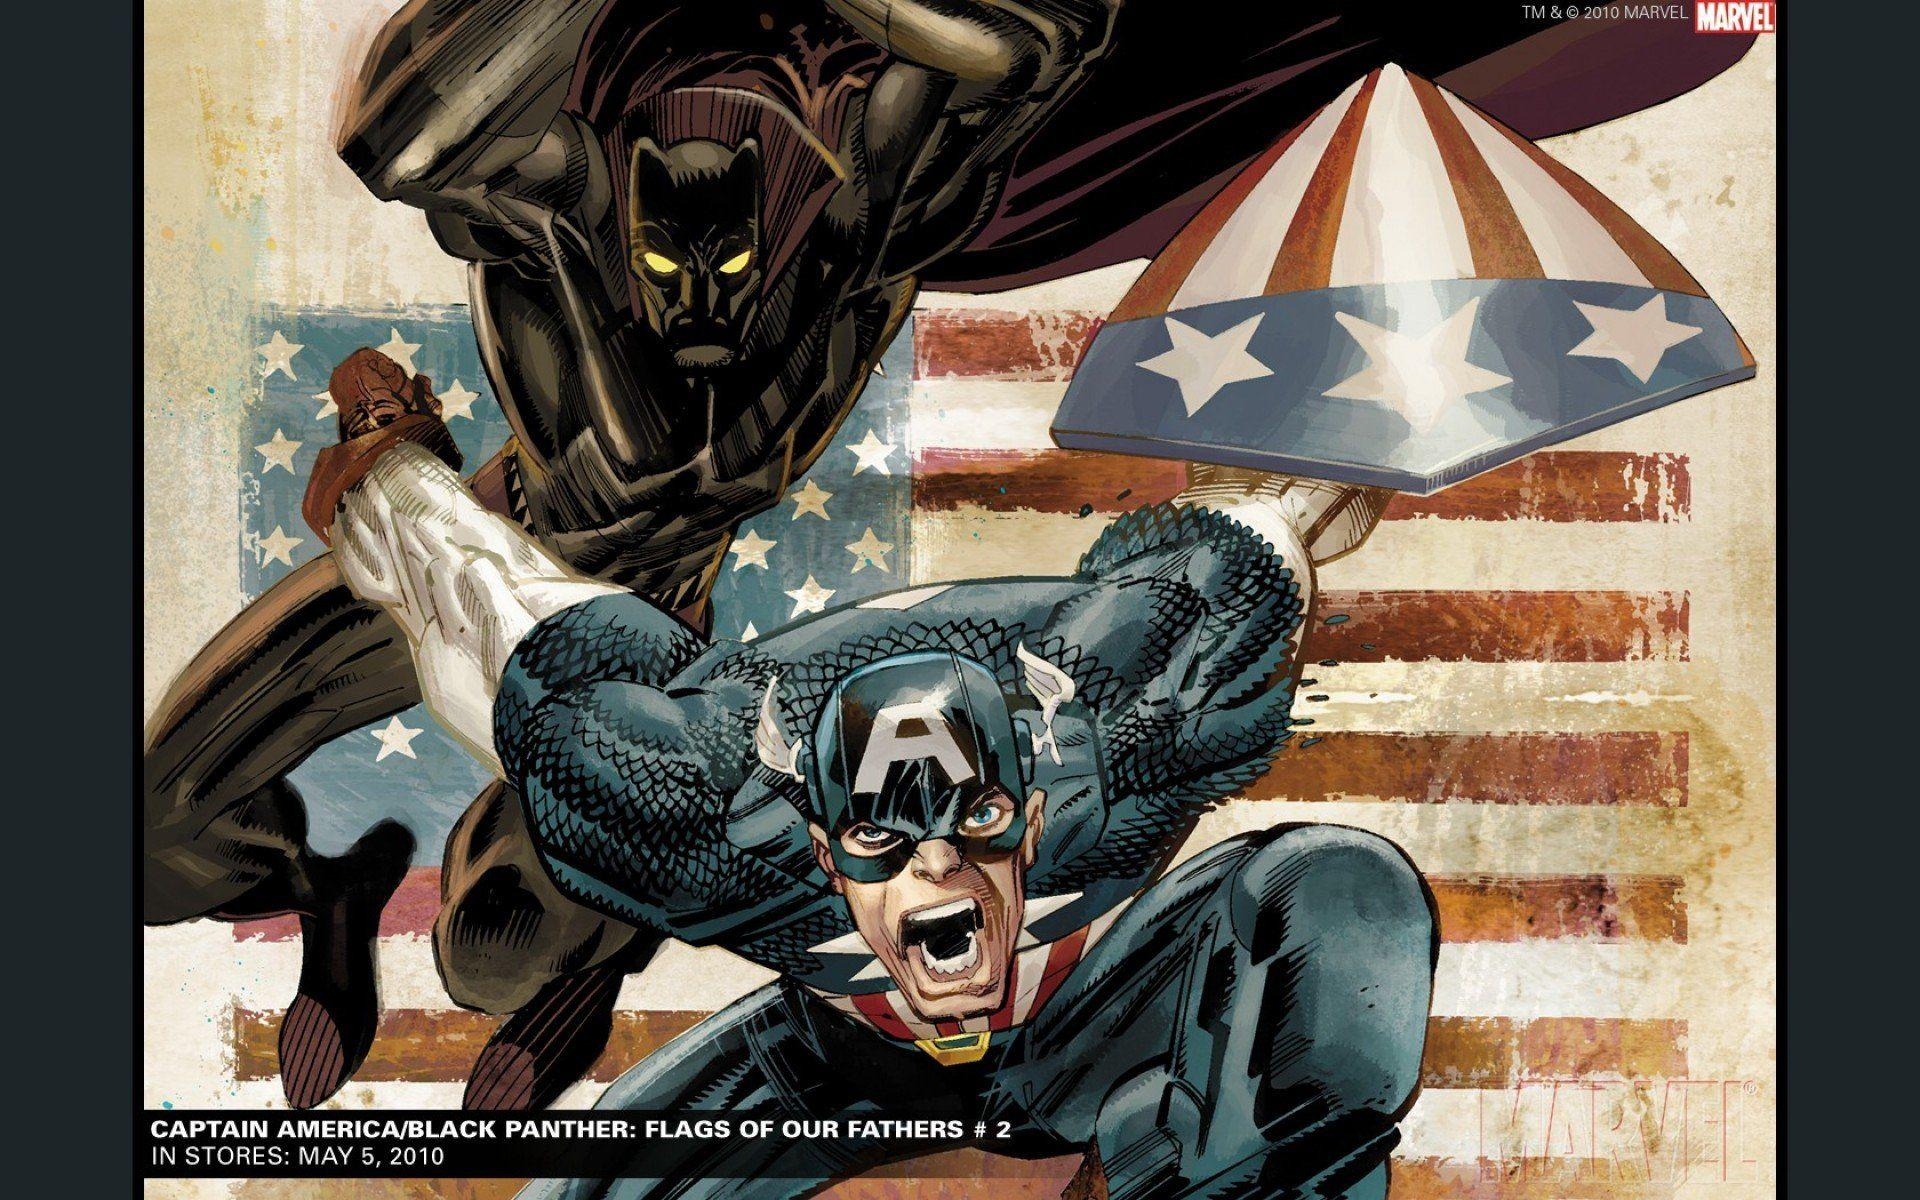 Black Panther Comic Wallpaper: Marvel Comics Black Panther Wallpapers